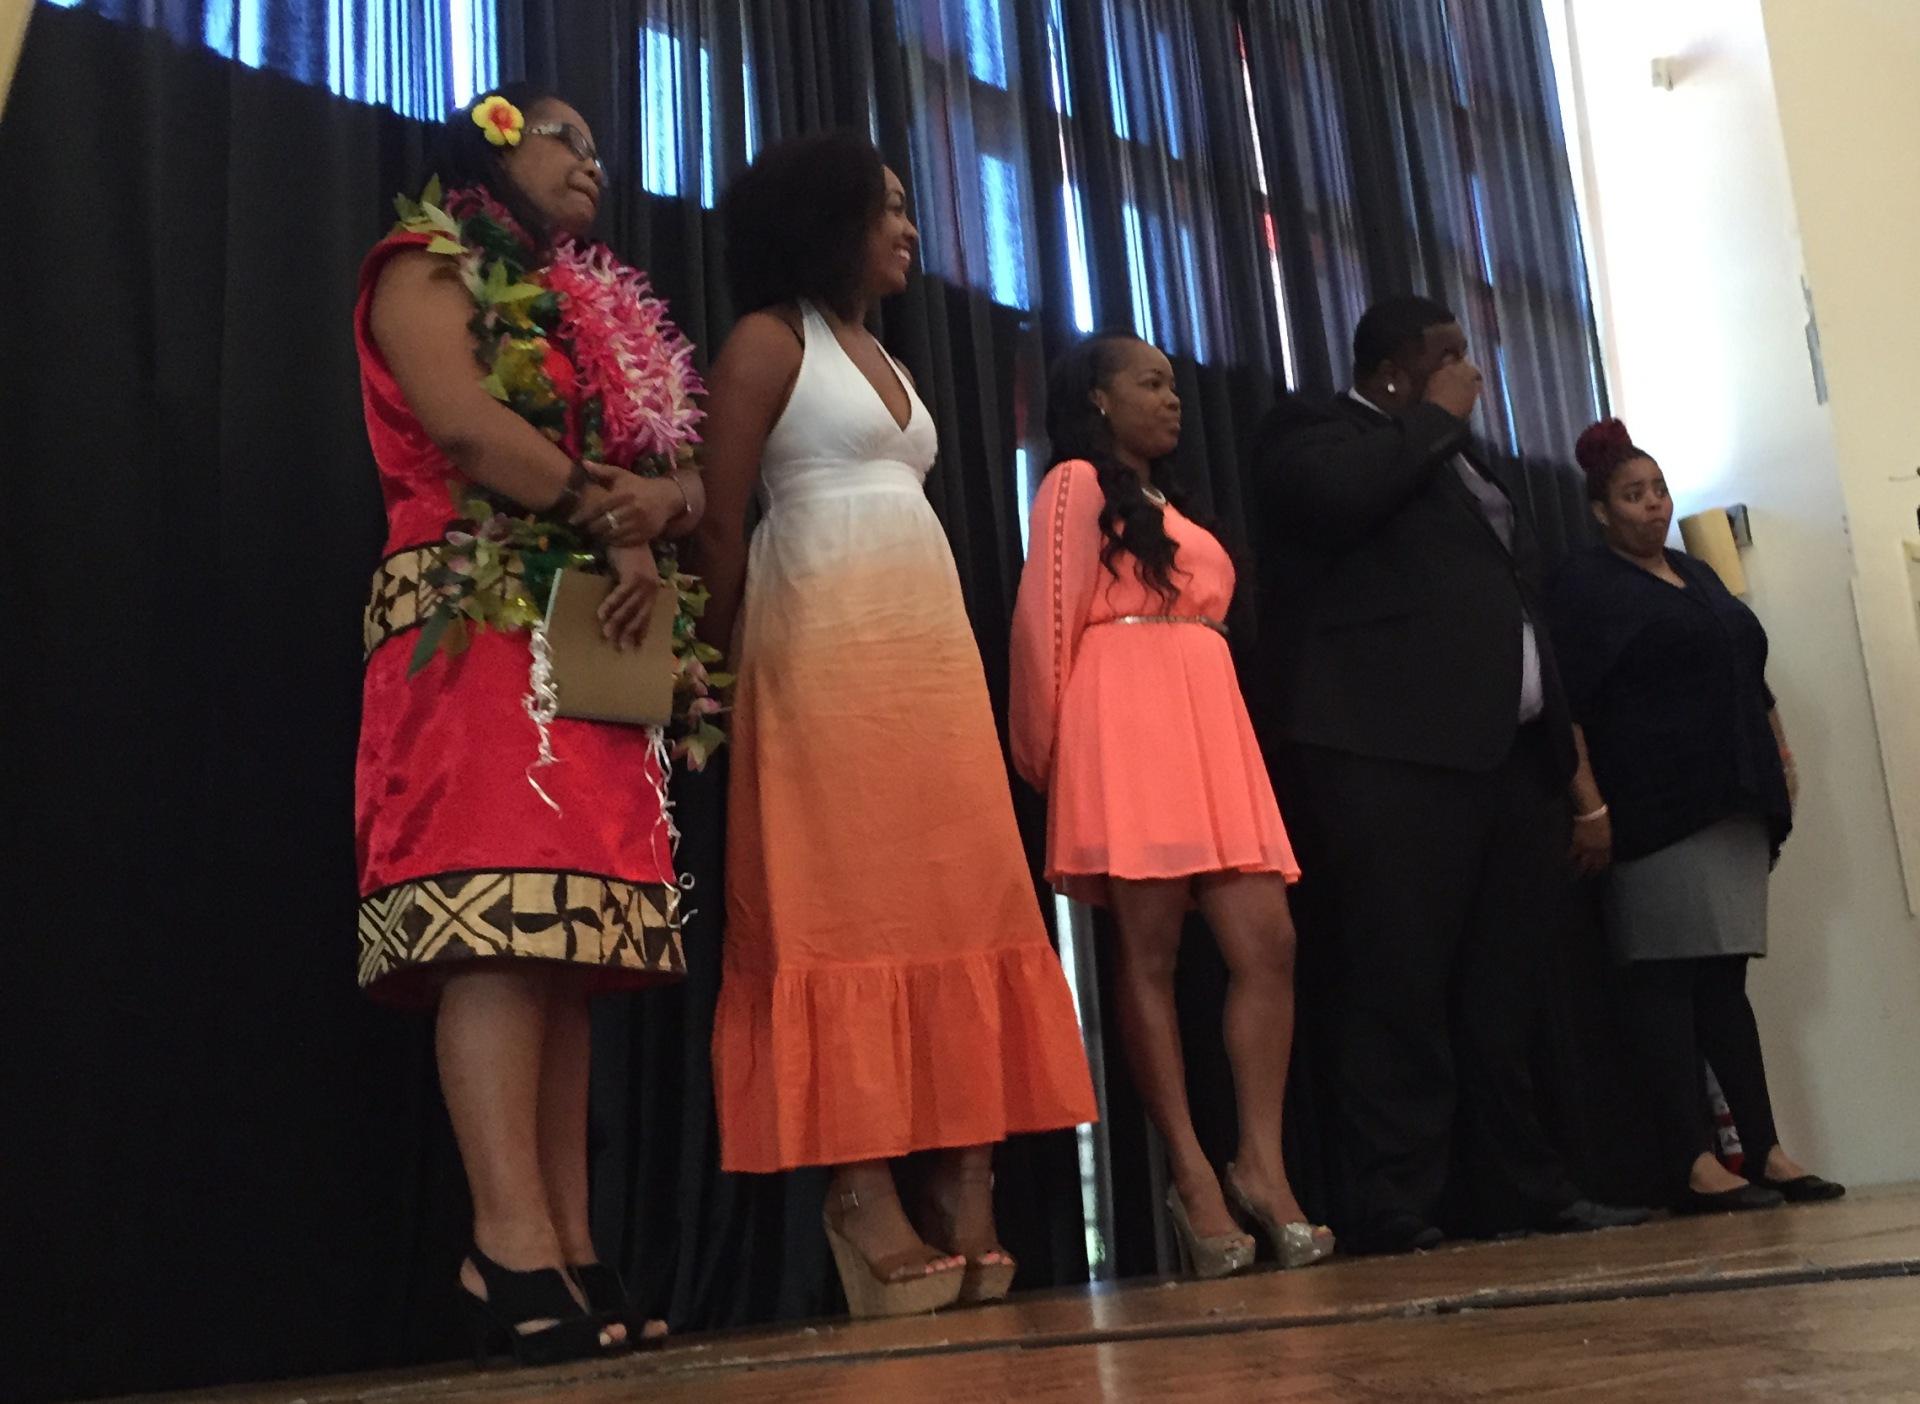 Alumni from Potrero Hill's Alive & Free organization and 2015 college graduates take the stage Aug. 2, 2015.